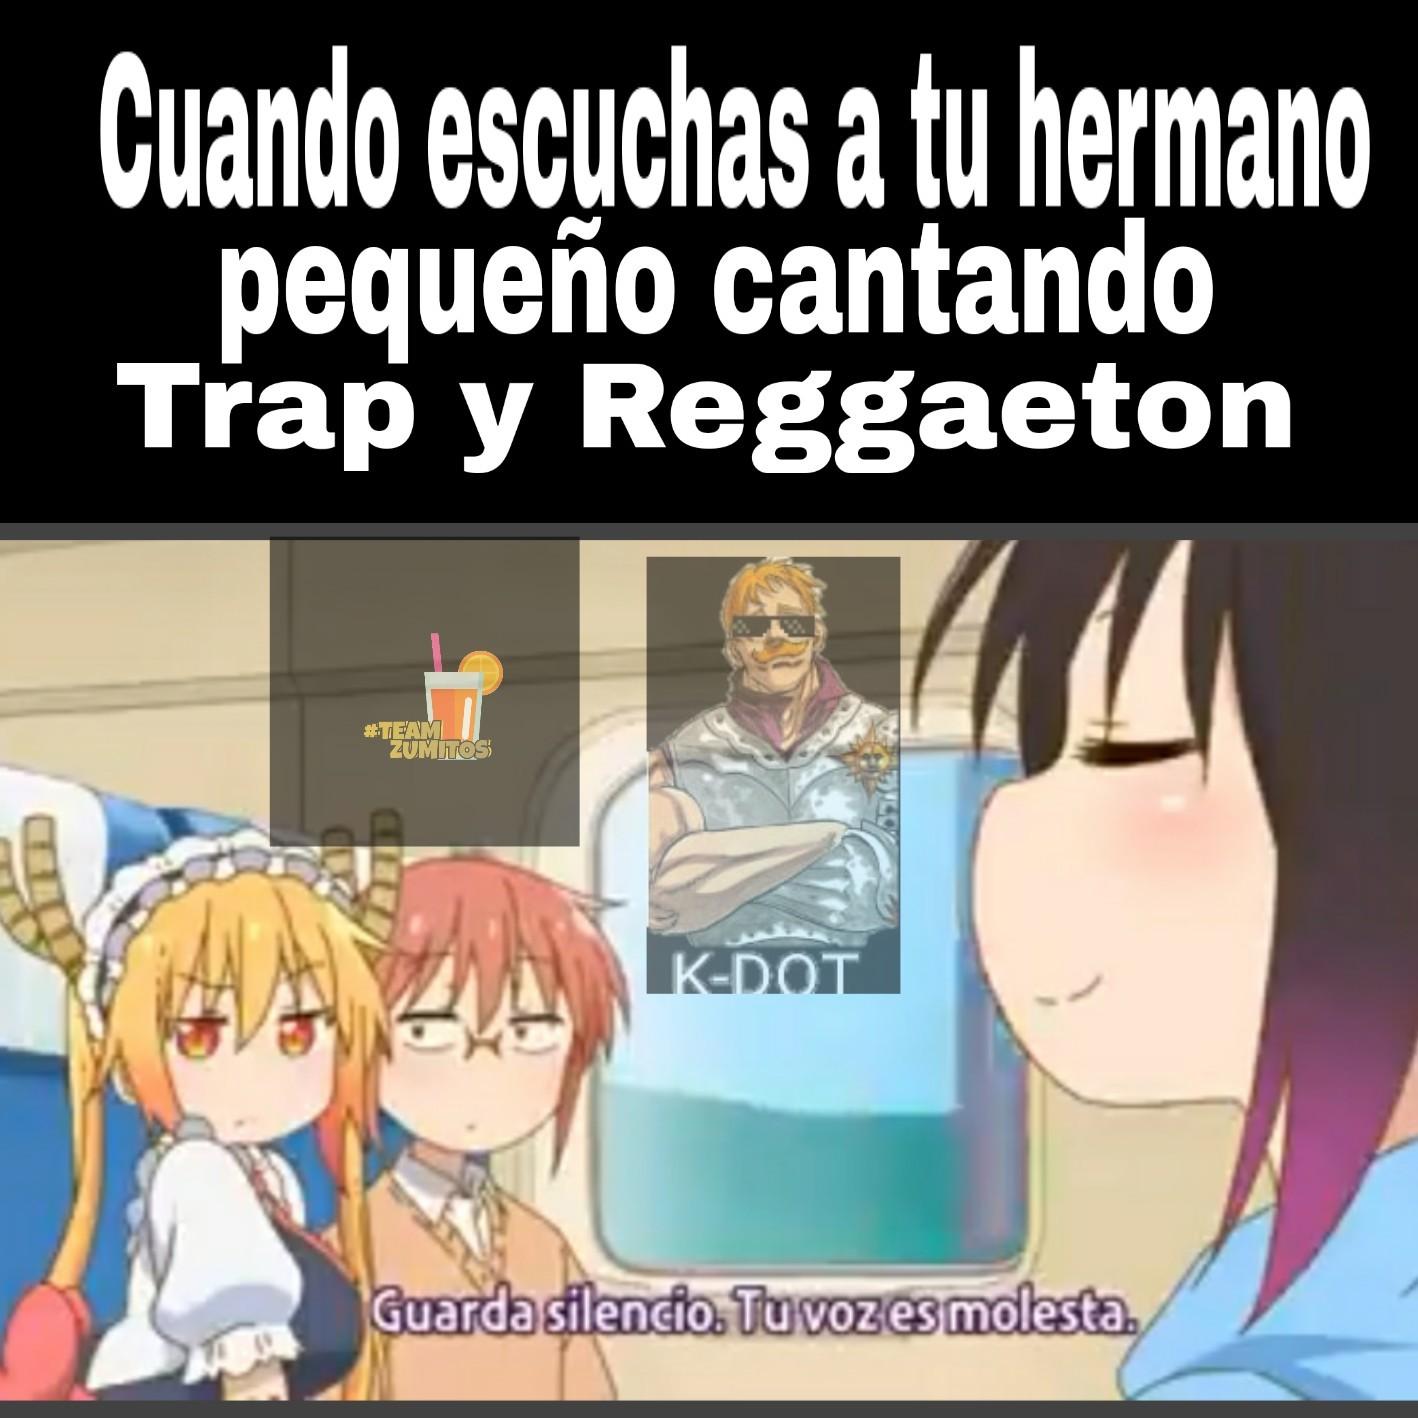 Al titulo no le gusta el Reggaeton - meme